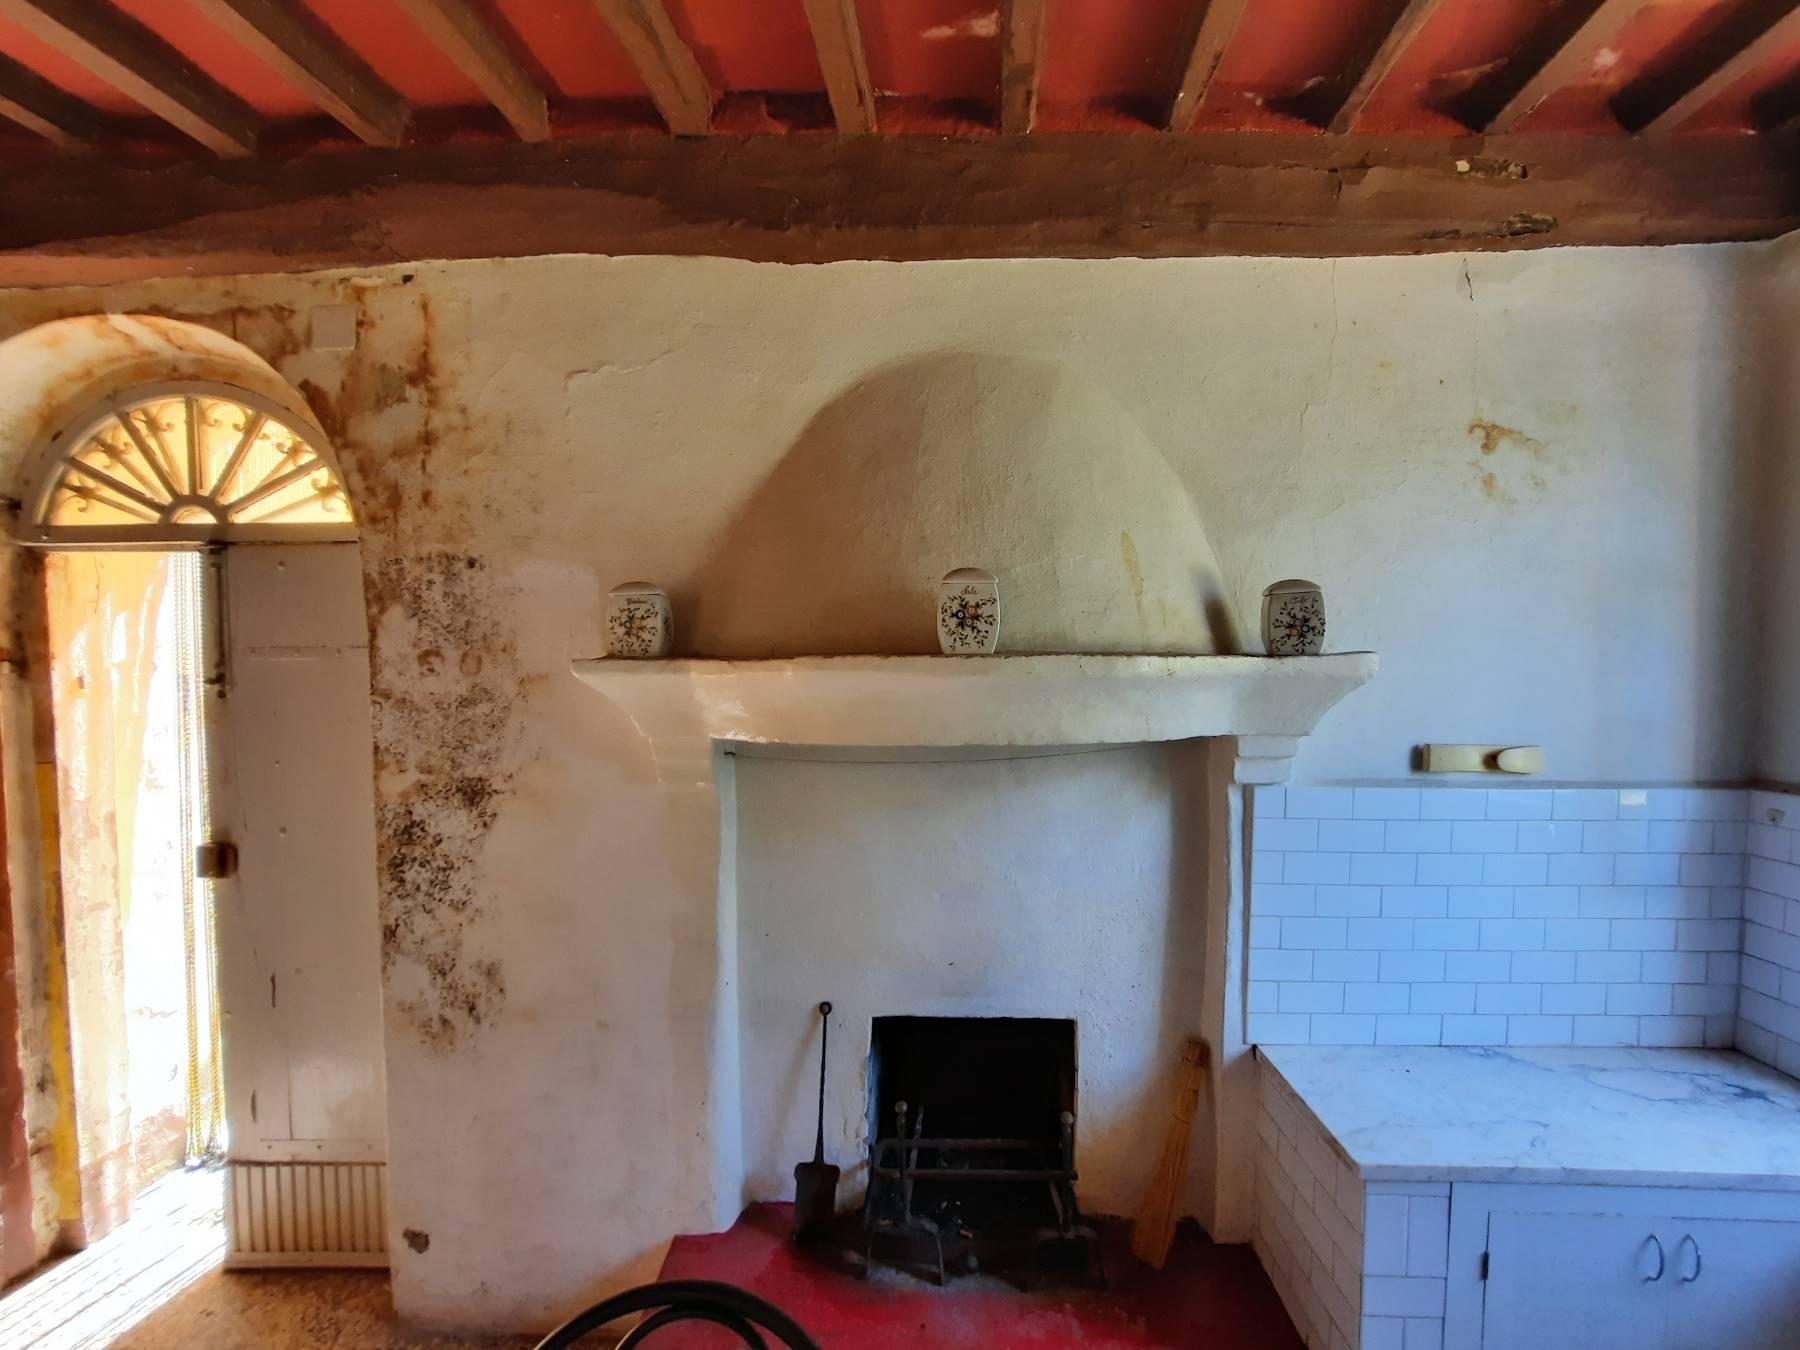 Il vecchio caminetto - The old fireplace